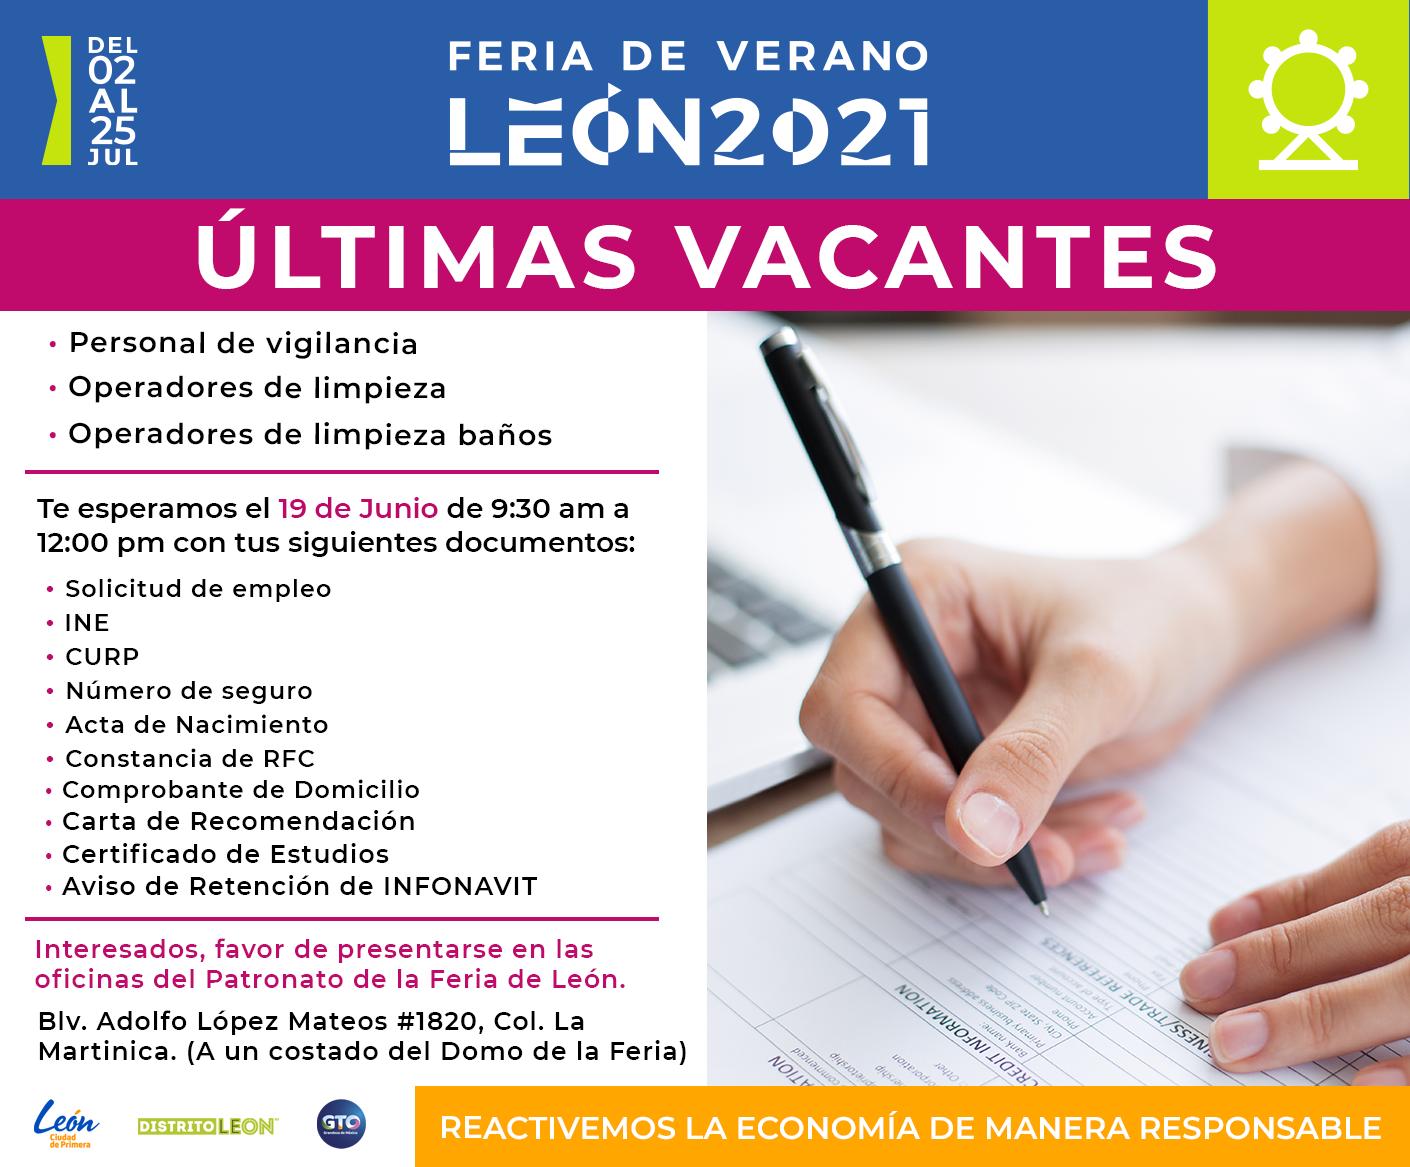 Feria de Verano León 2021: Ultimas vacantes